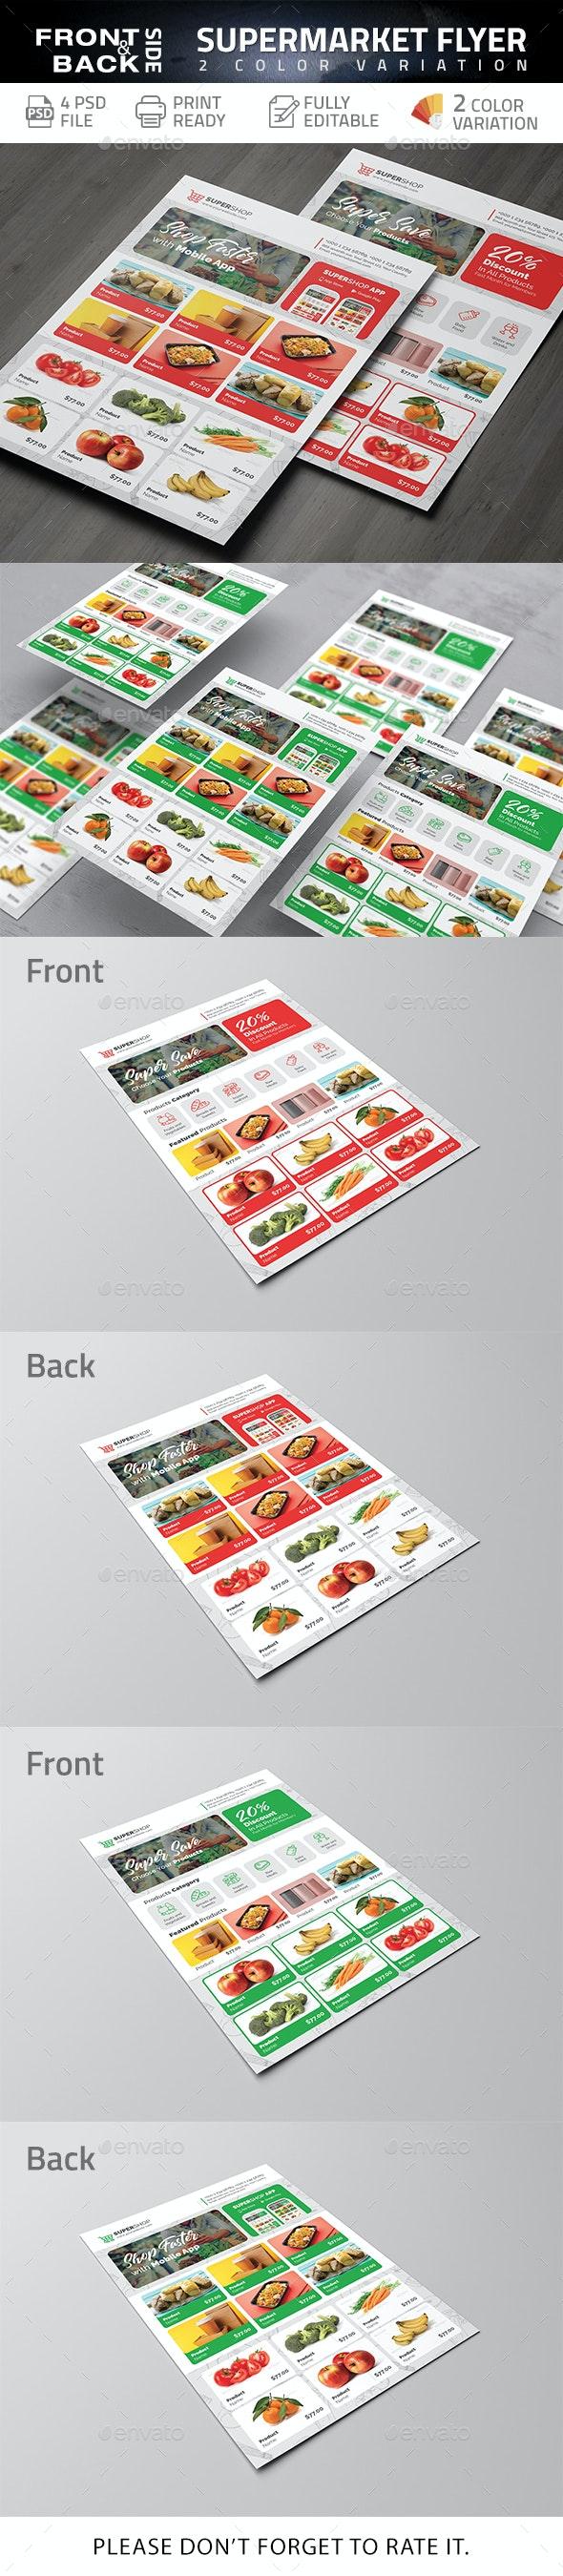 Supermarket Flyer - Commerce Flyers